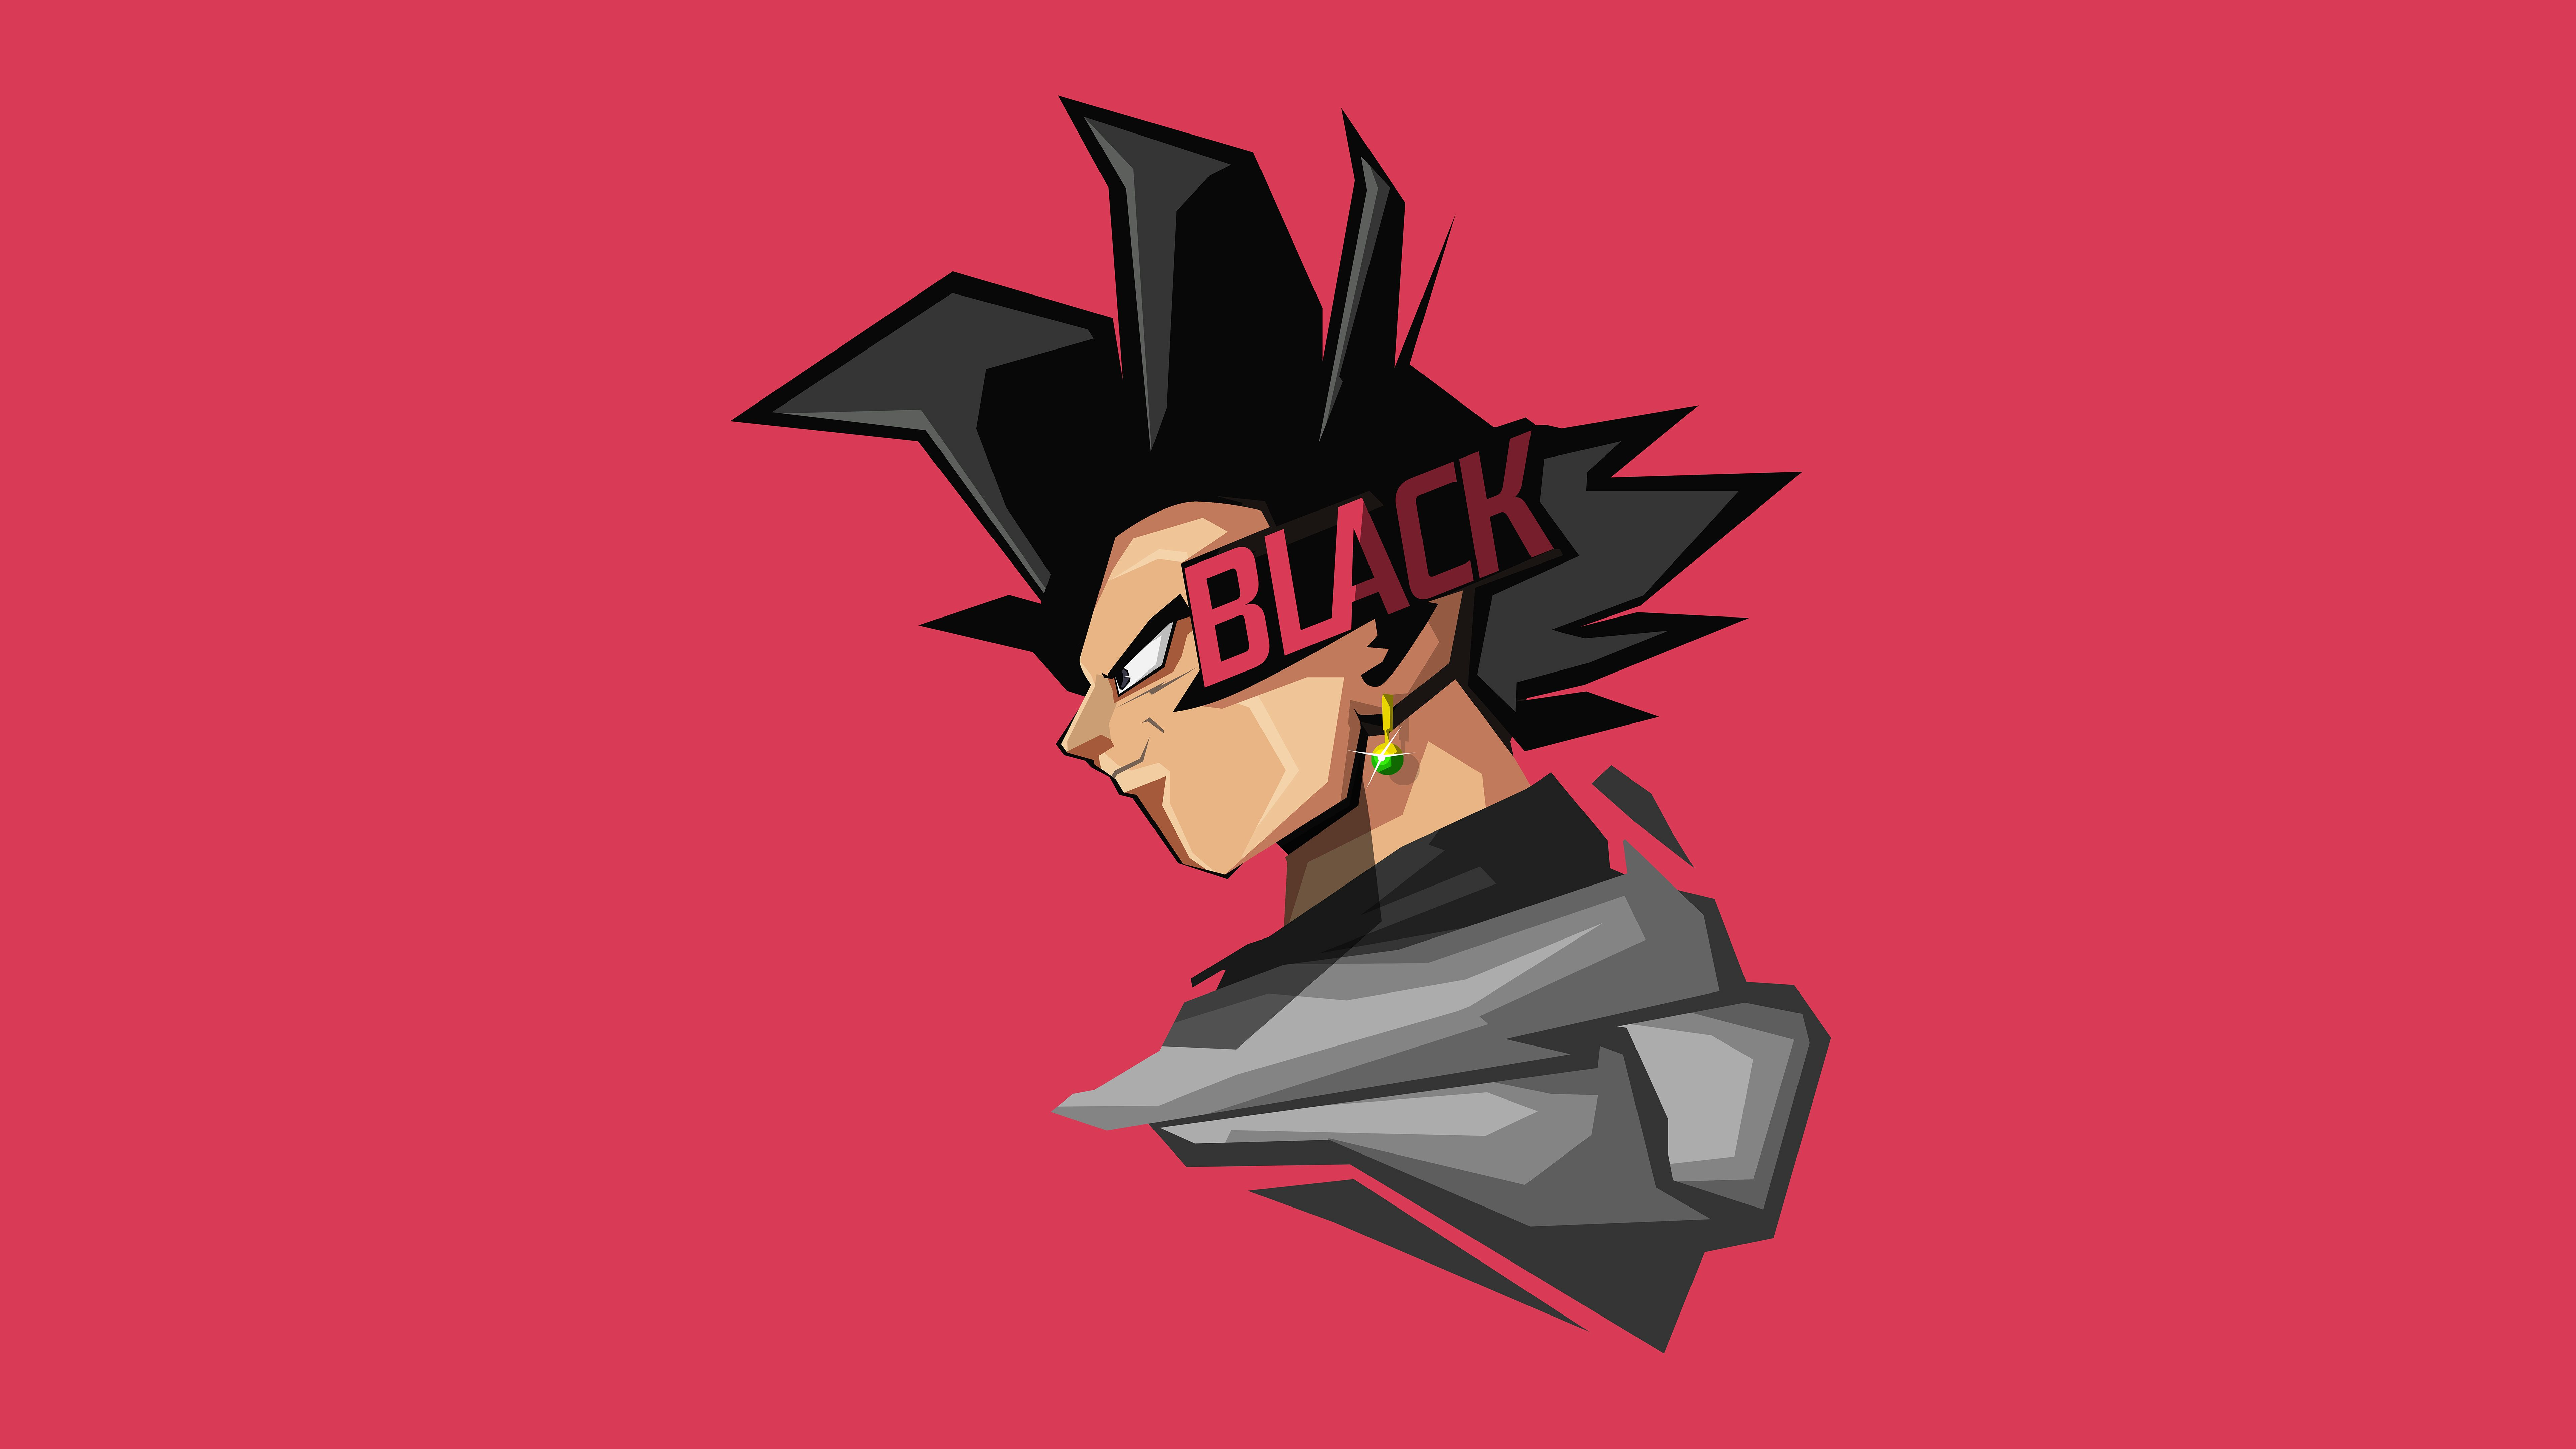 Goku Black Minimal Artwork 4k 8k Anime Wallpaper Hd Cool Wallpapers Hd Anime Wallpapers